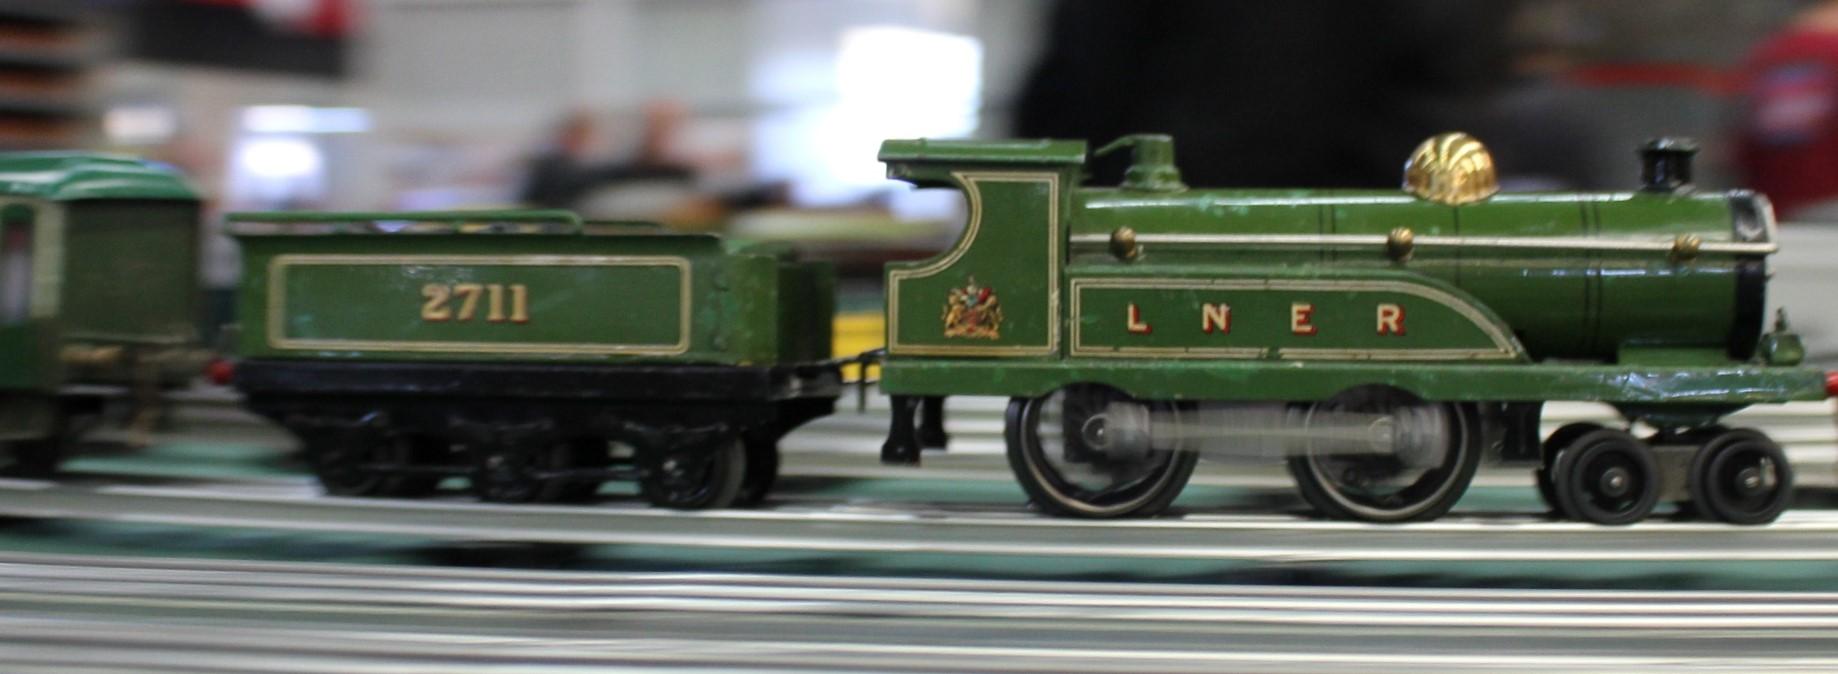 No. 2 LNER